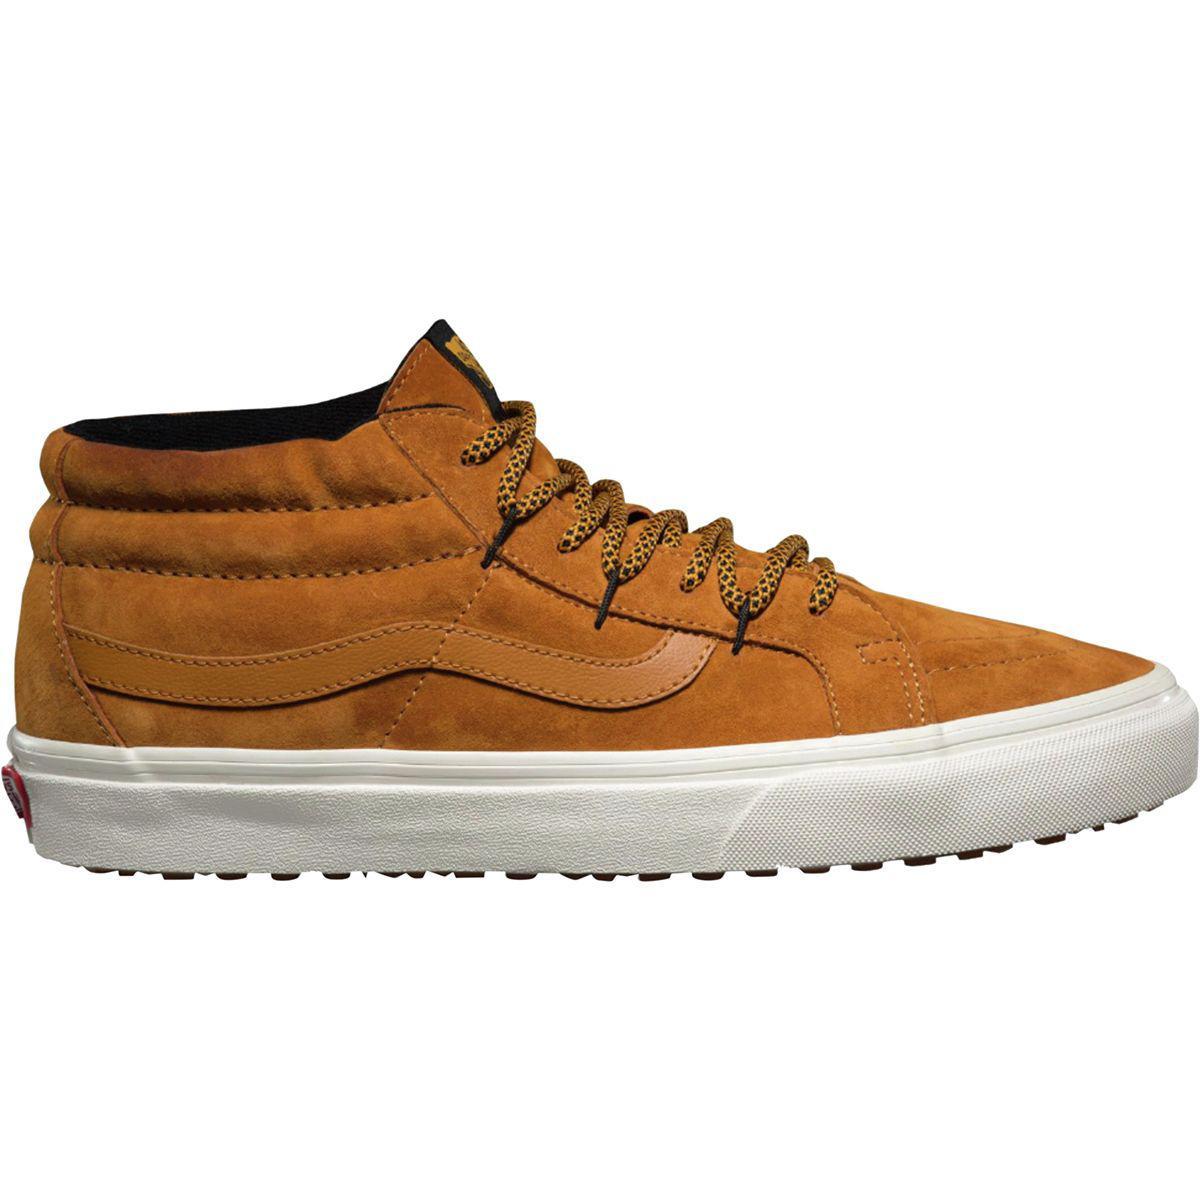 3f77443d64 Lyst - Vans Sk8-mid Reissue Ghillie Mte Shoe in Brown for Men